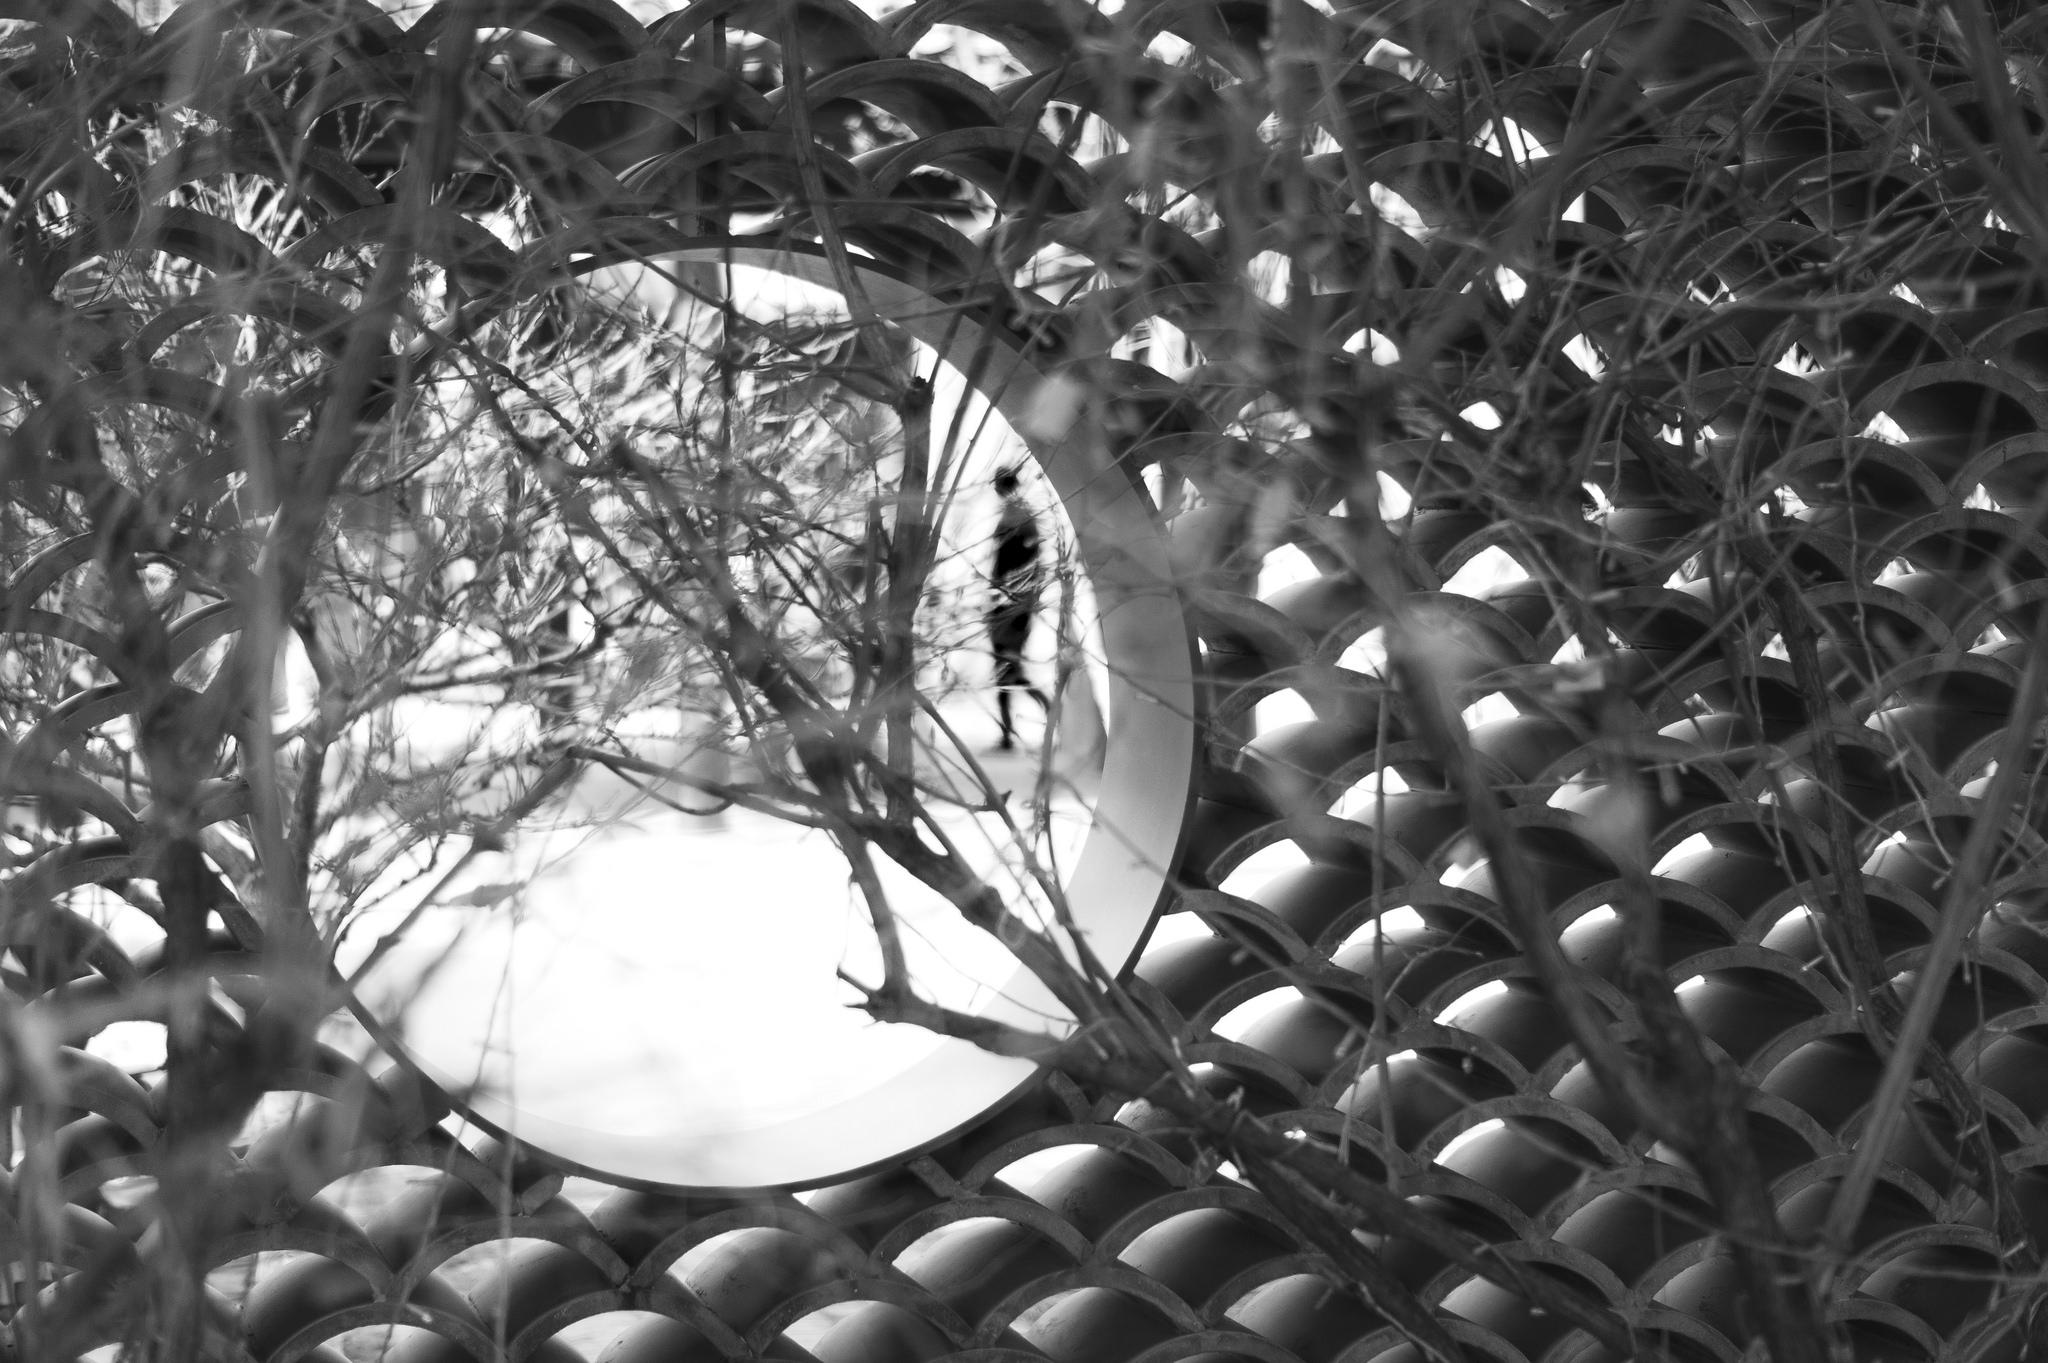 fence-with-peephole-focused-on-blurry-man